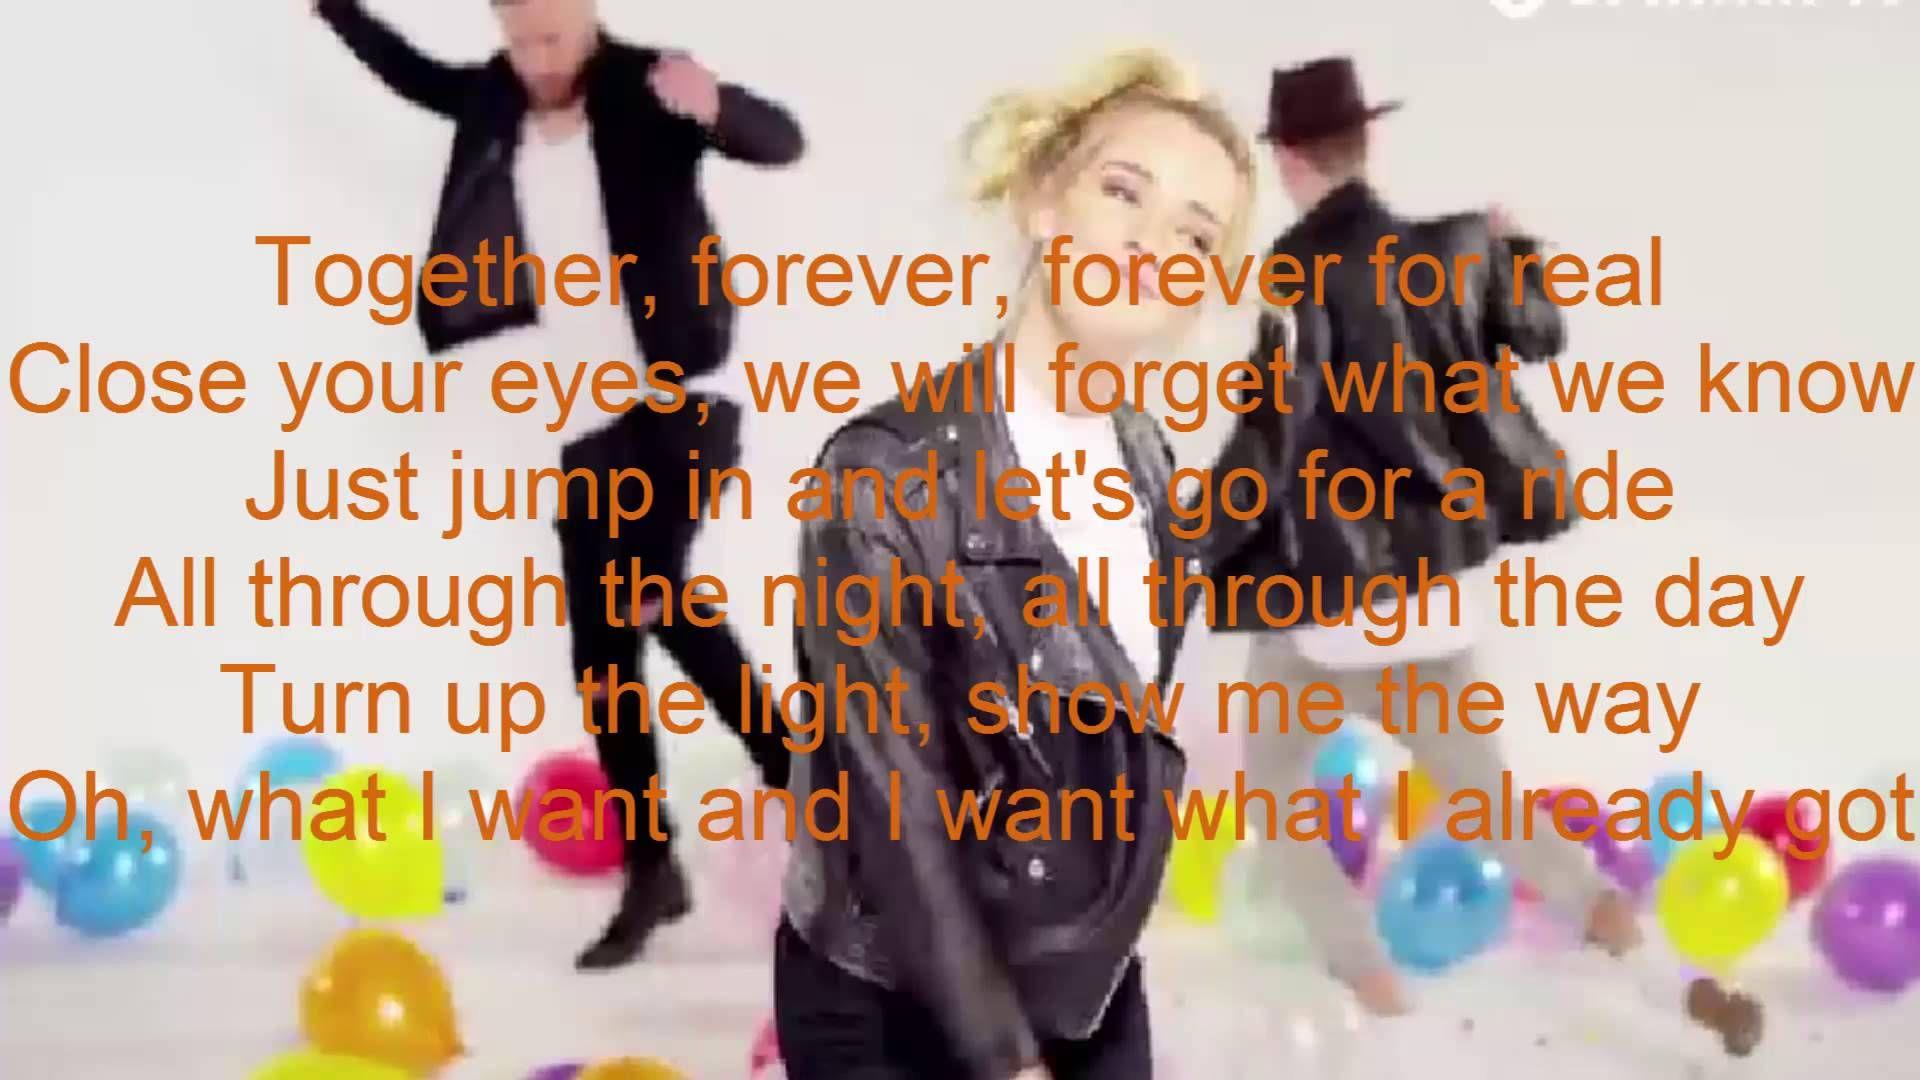 Turn It Up Meme Lyrics